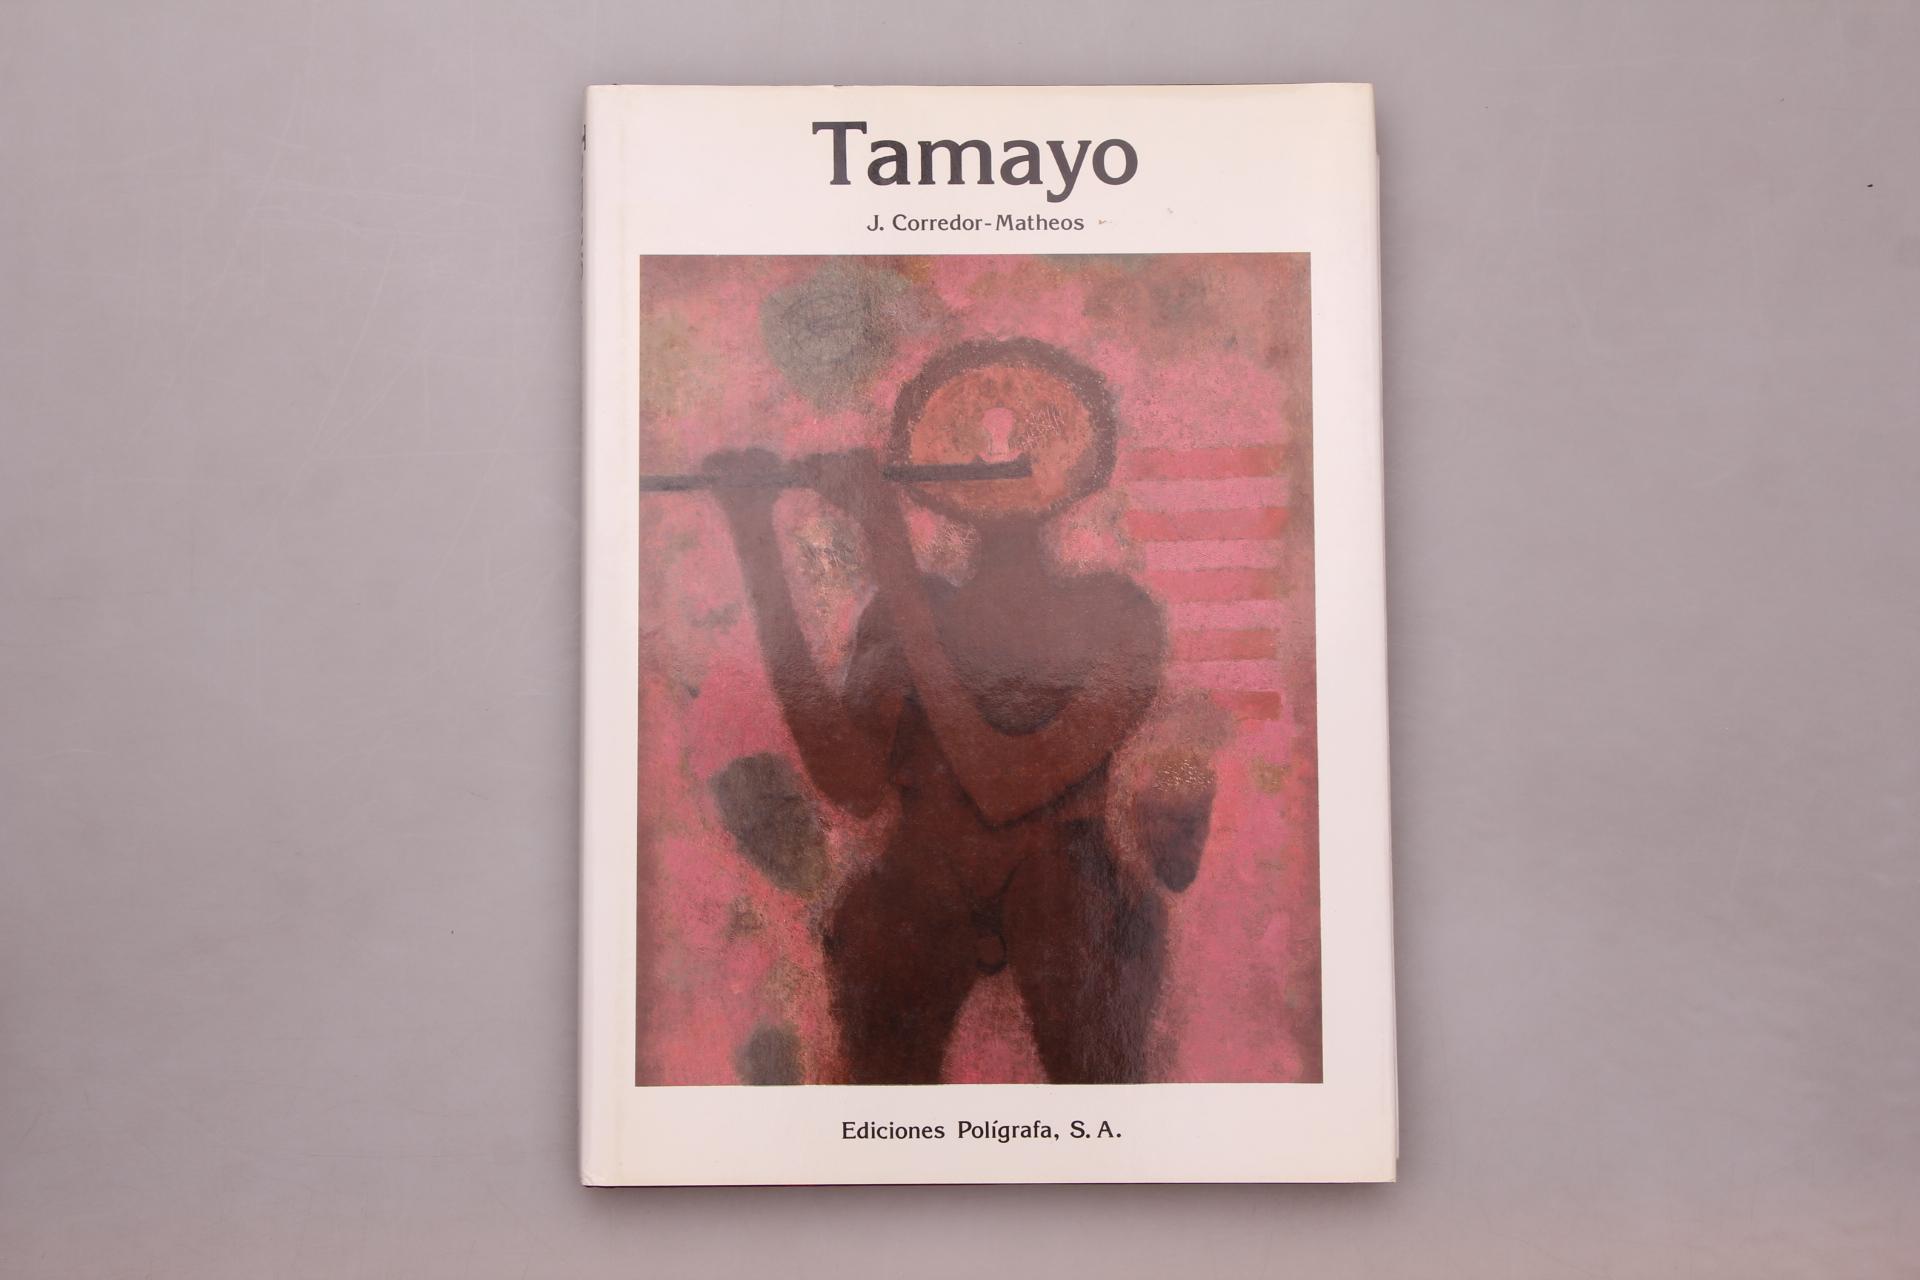 Corredor-Matheos, Jose TAMAYO